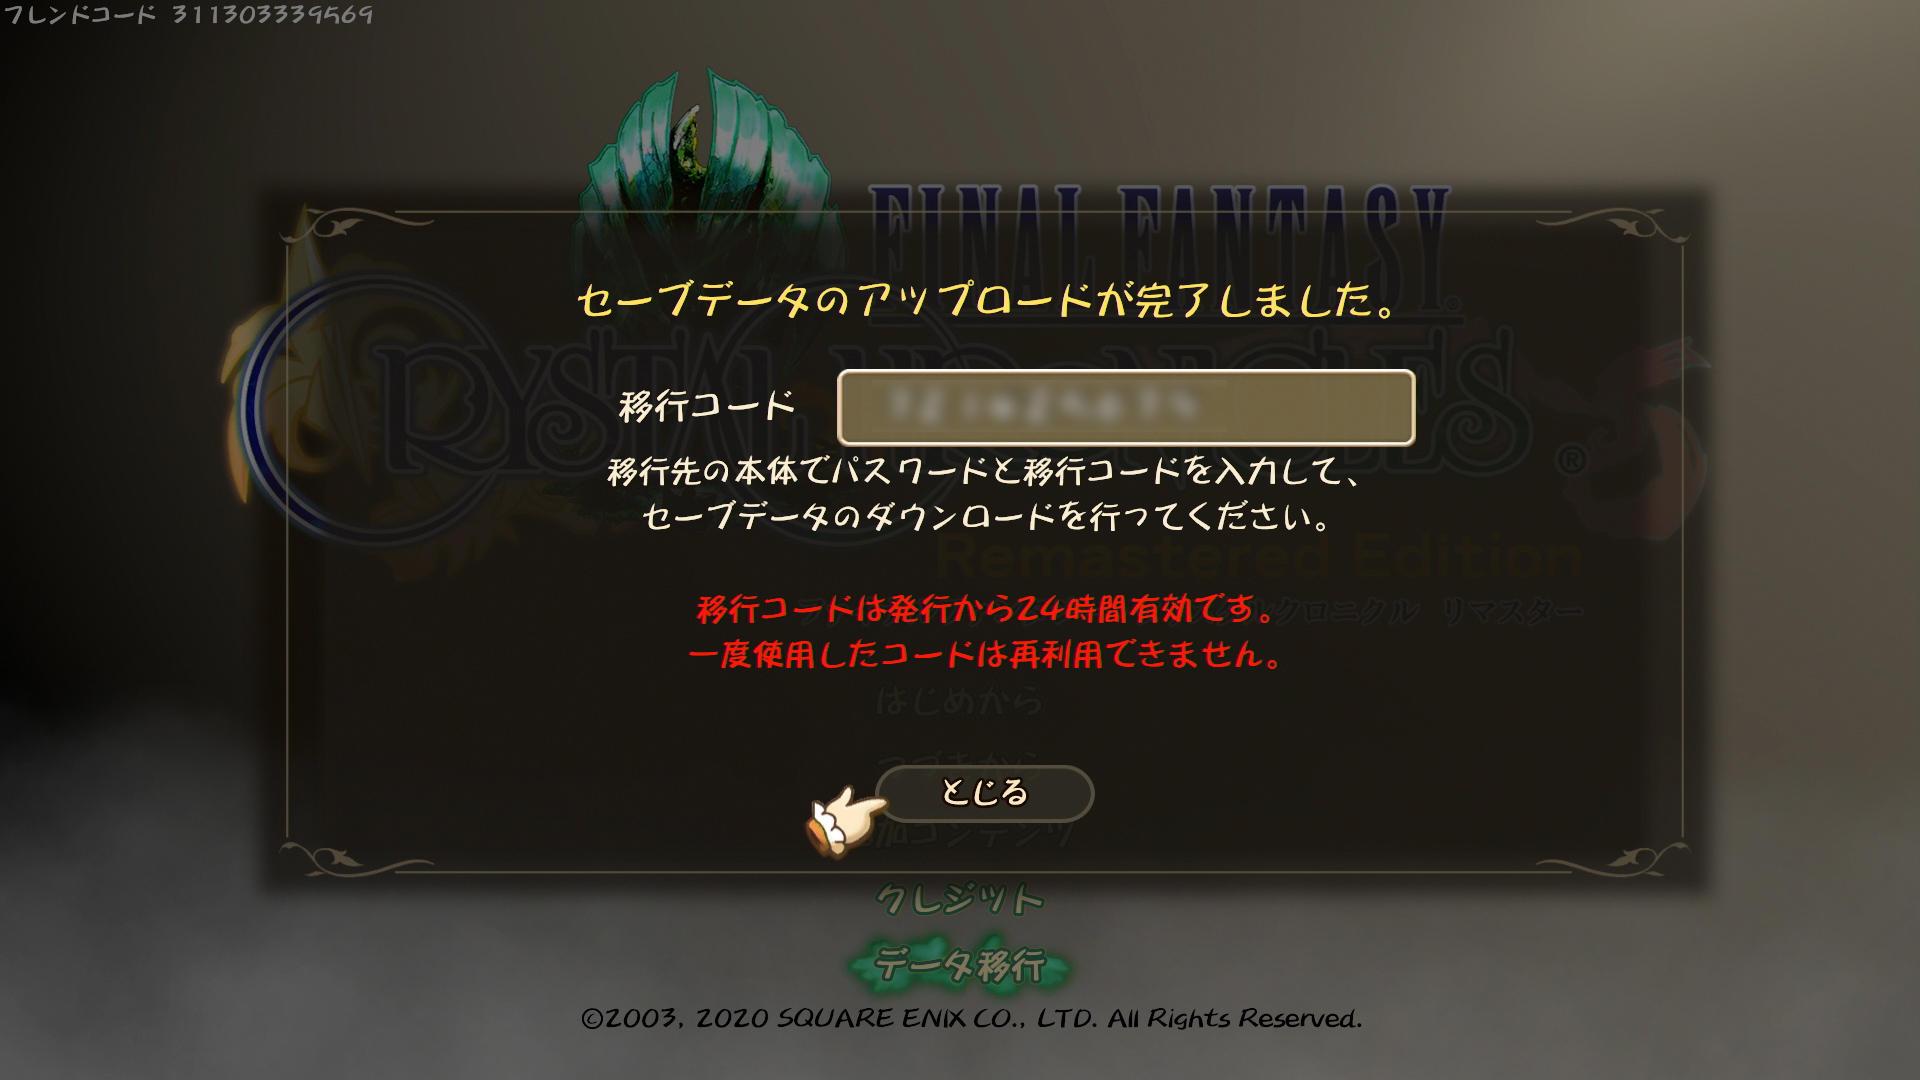 Capture0023.00_00_42_39_調整.jpg